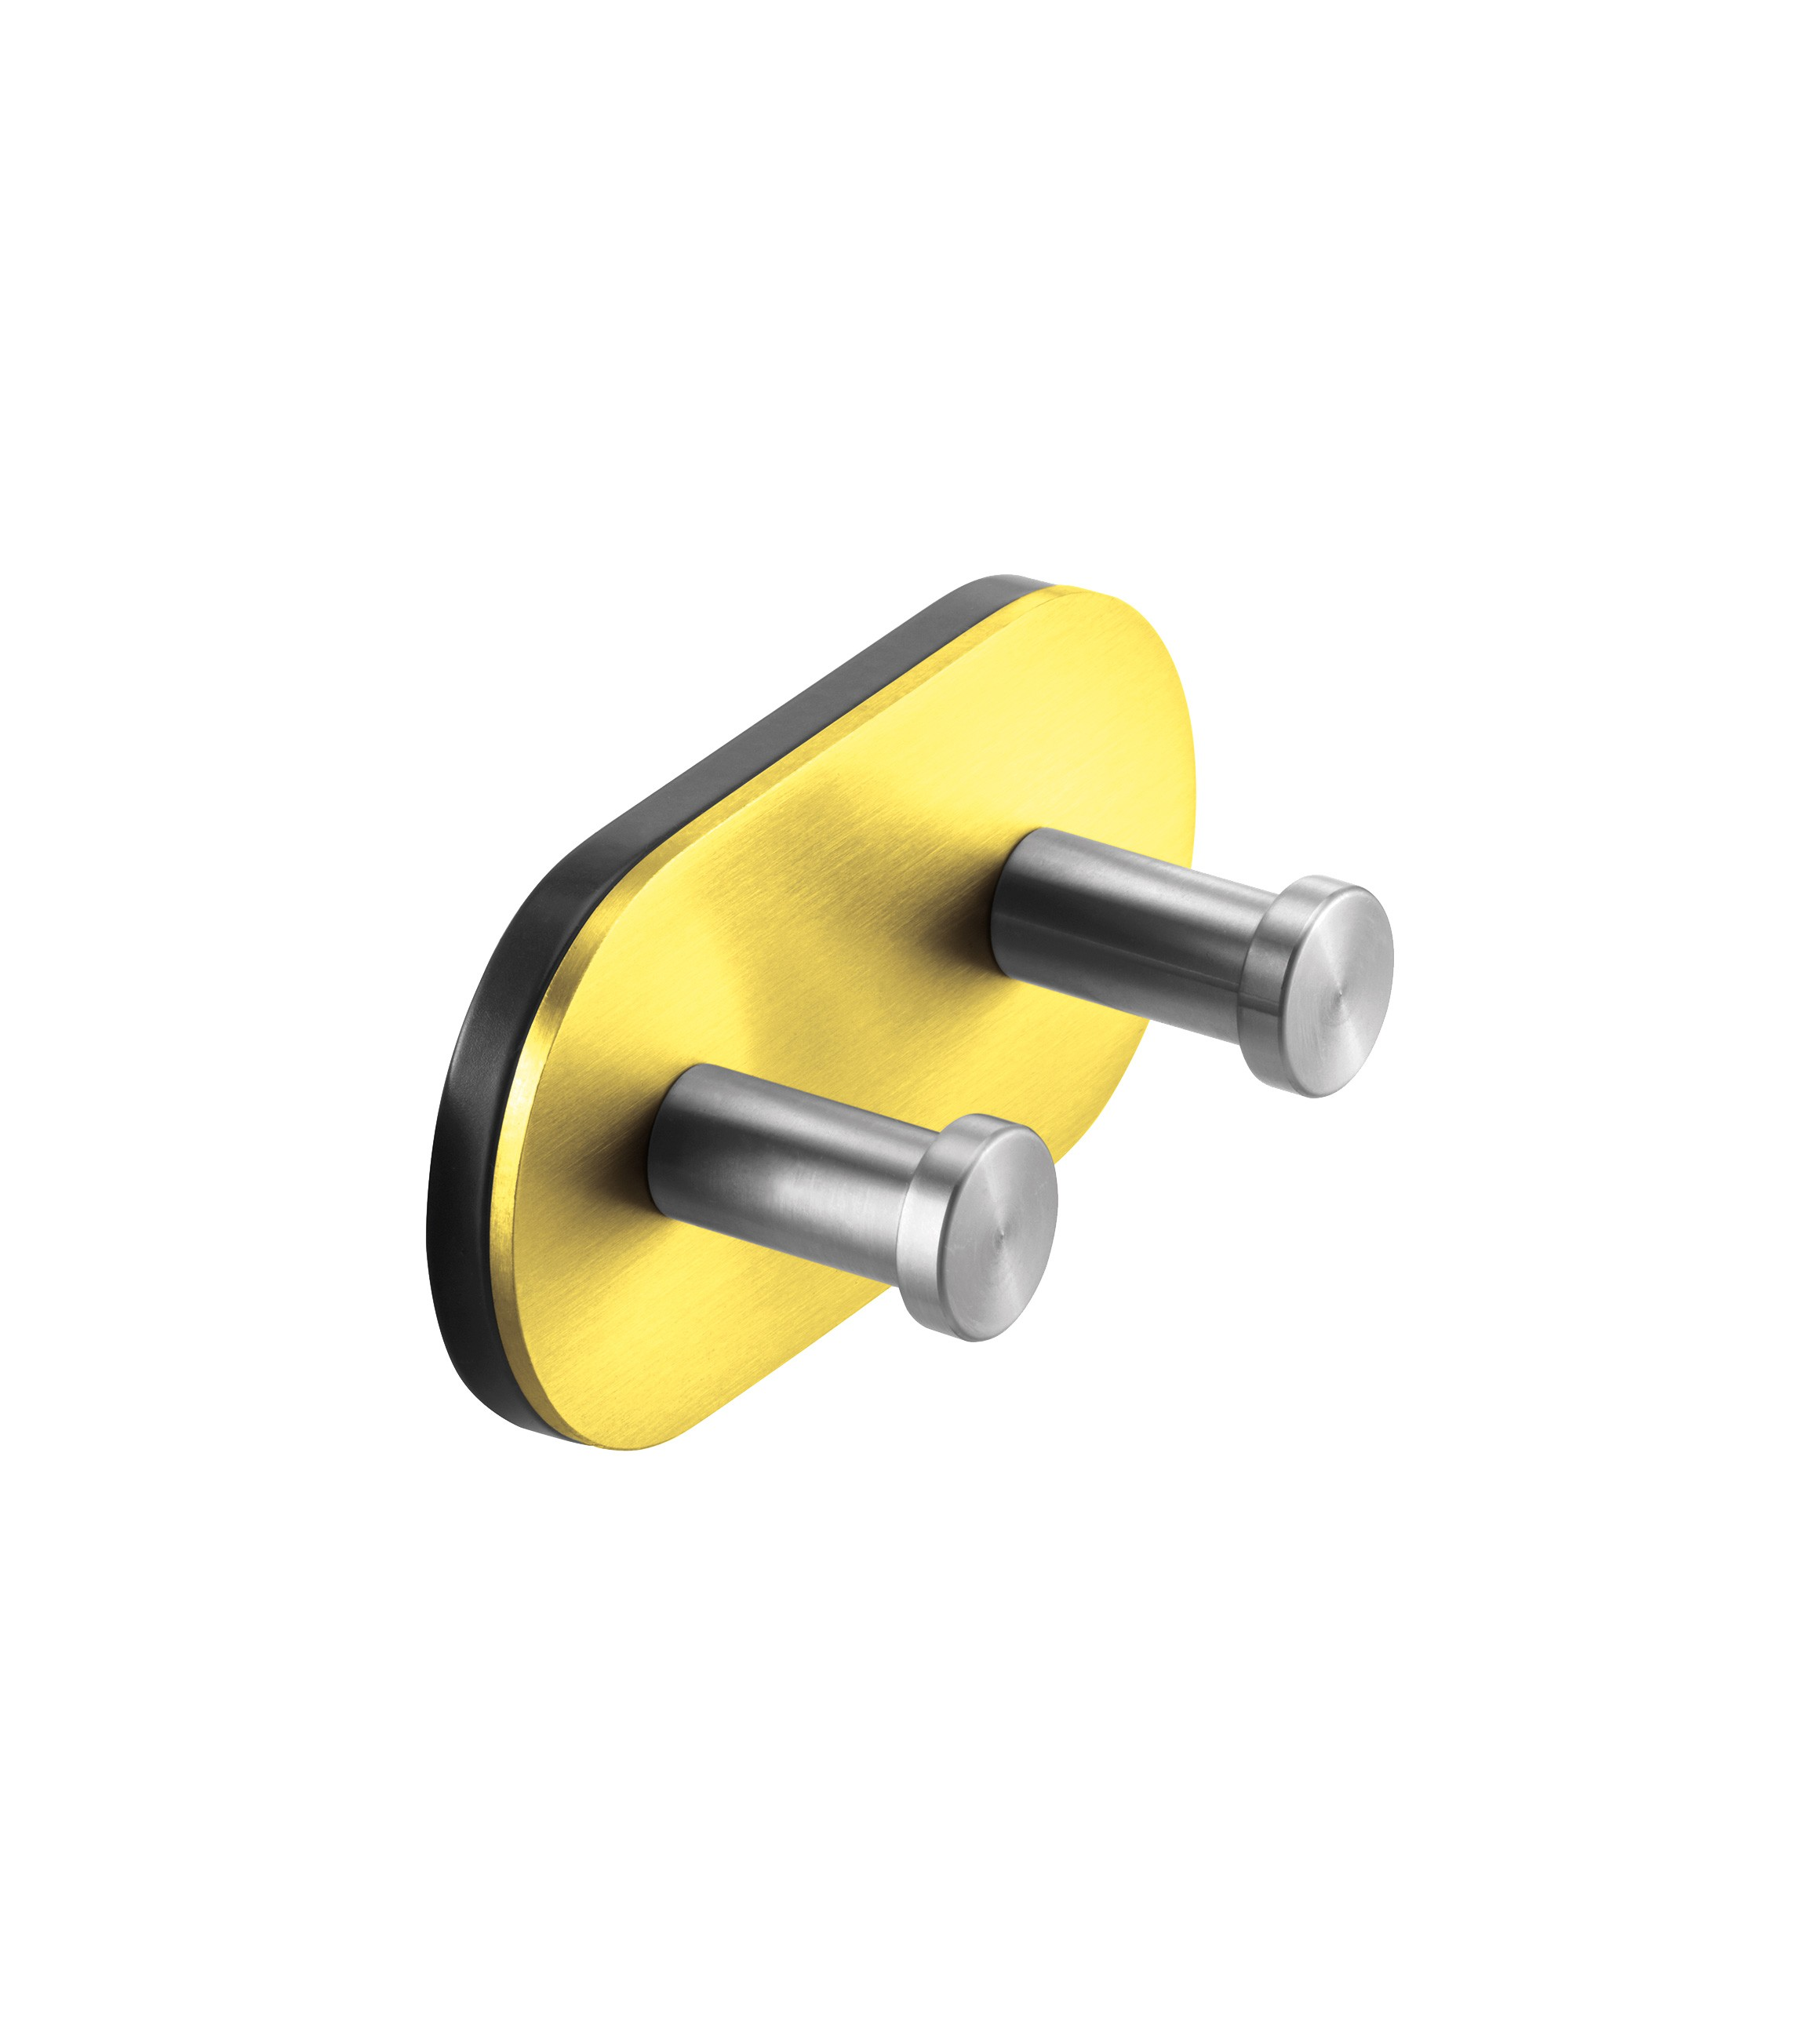 FSB Doppel-Wandhaken gelb RAL 1018 Edelstahl / gelb (0 82 8260 00007 8700)